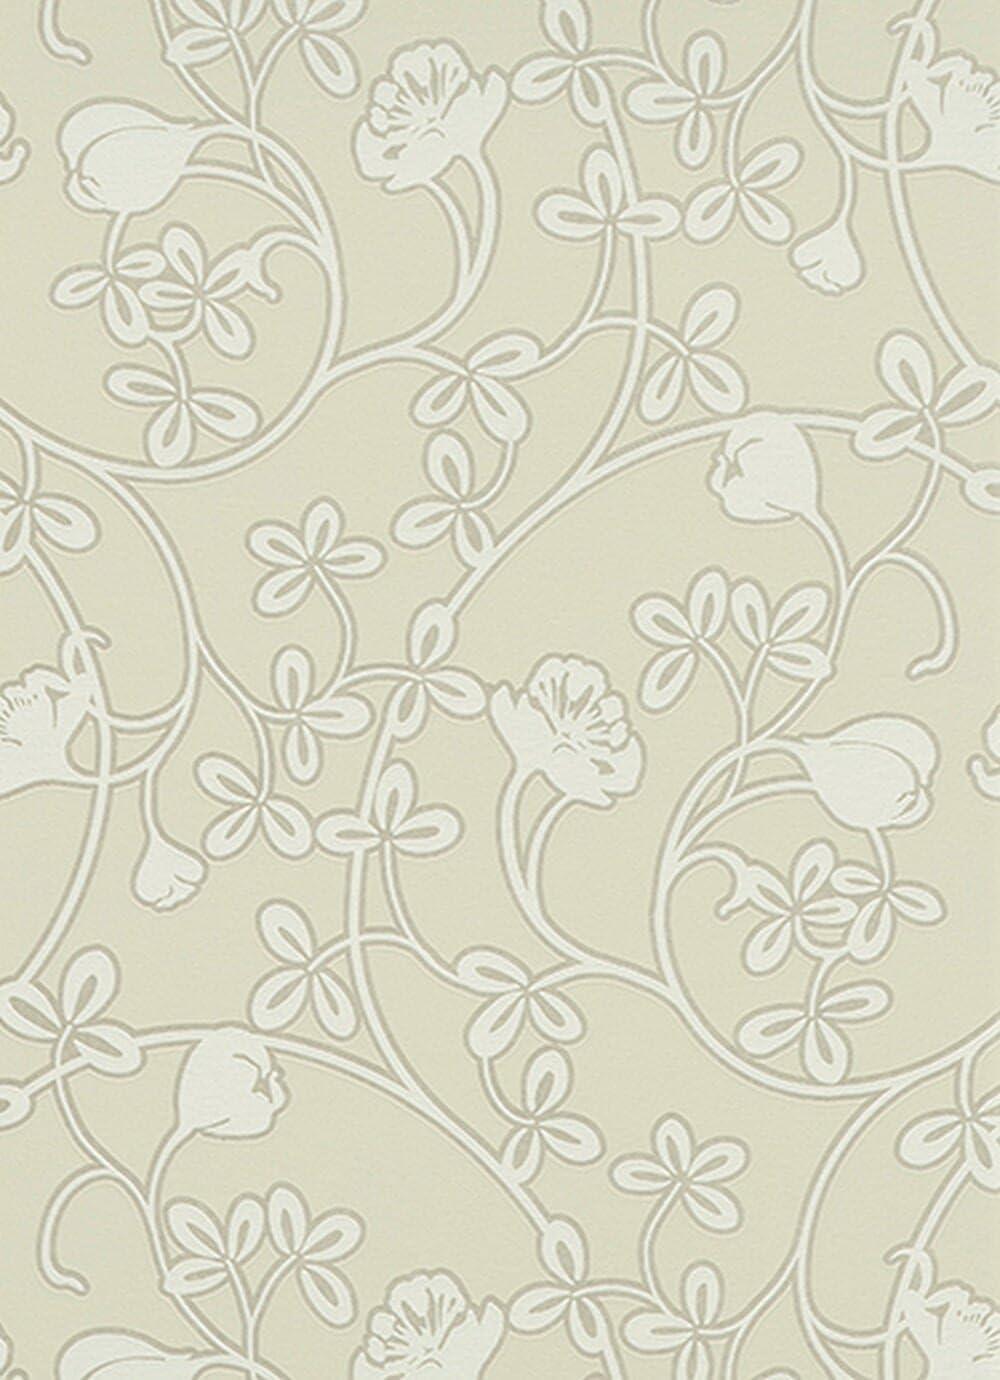 Glossy Scandinavian Air Traditional Floral Flower Green